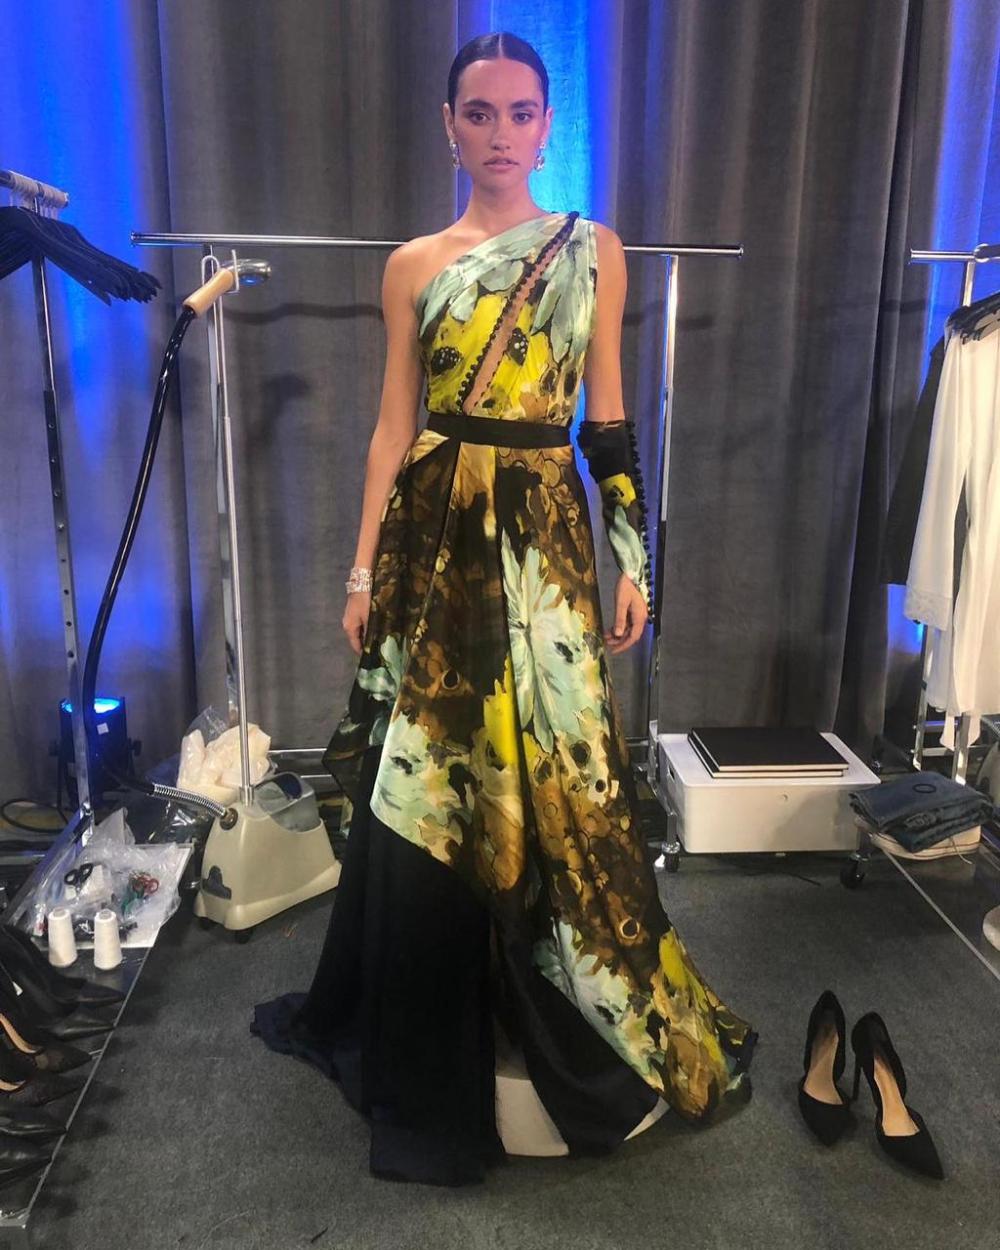 Designer Narresh Kukreja On His Time On The Next In Fashion Series Netflixseries Nextinfashion Shivan Narresh Exclusivei In 2020 Fashion Harajuku Fashion Outfits